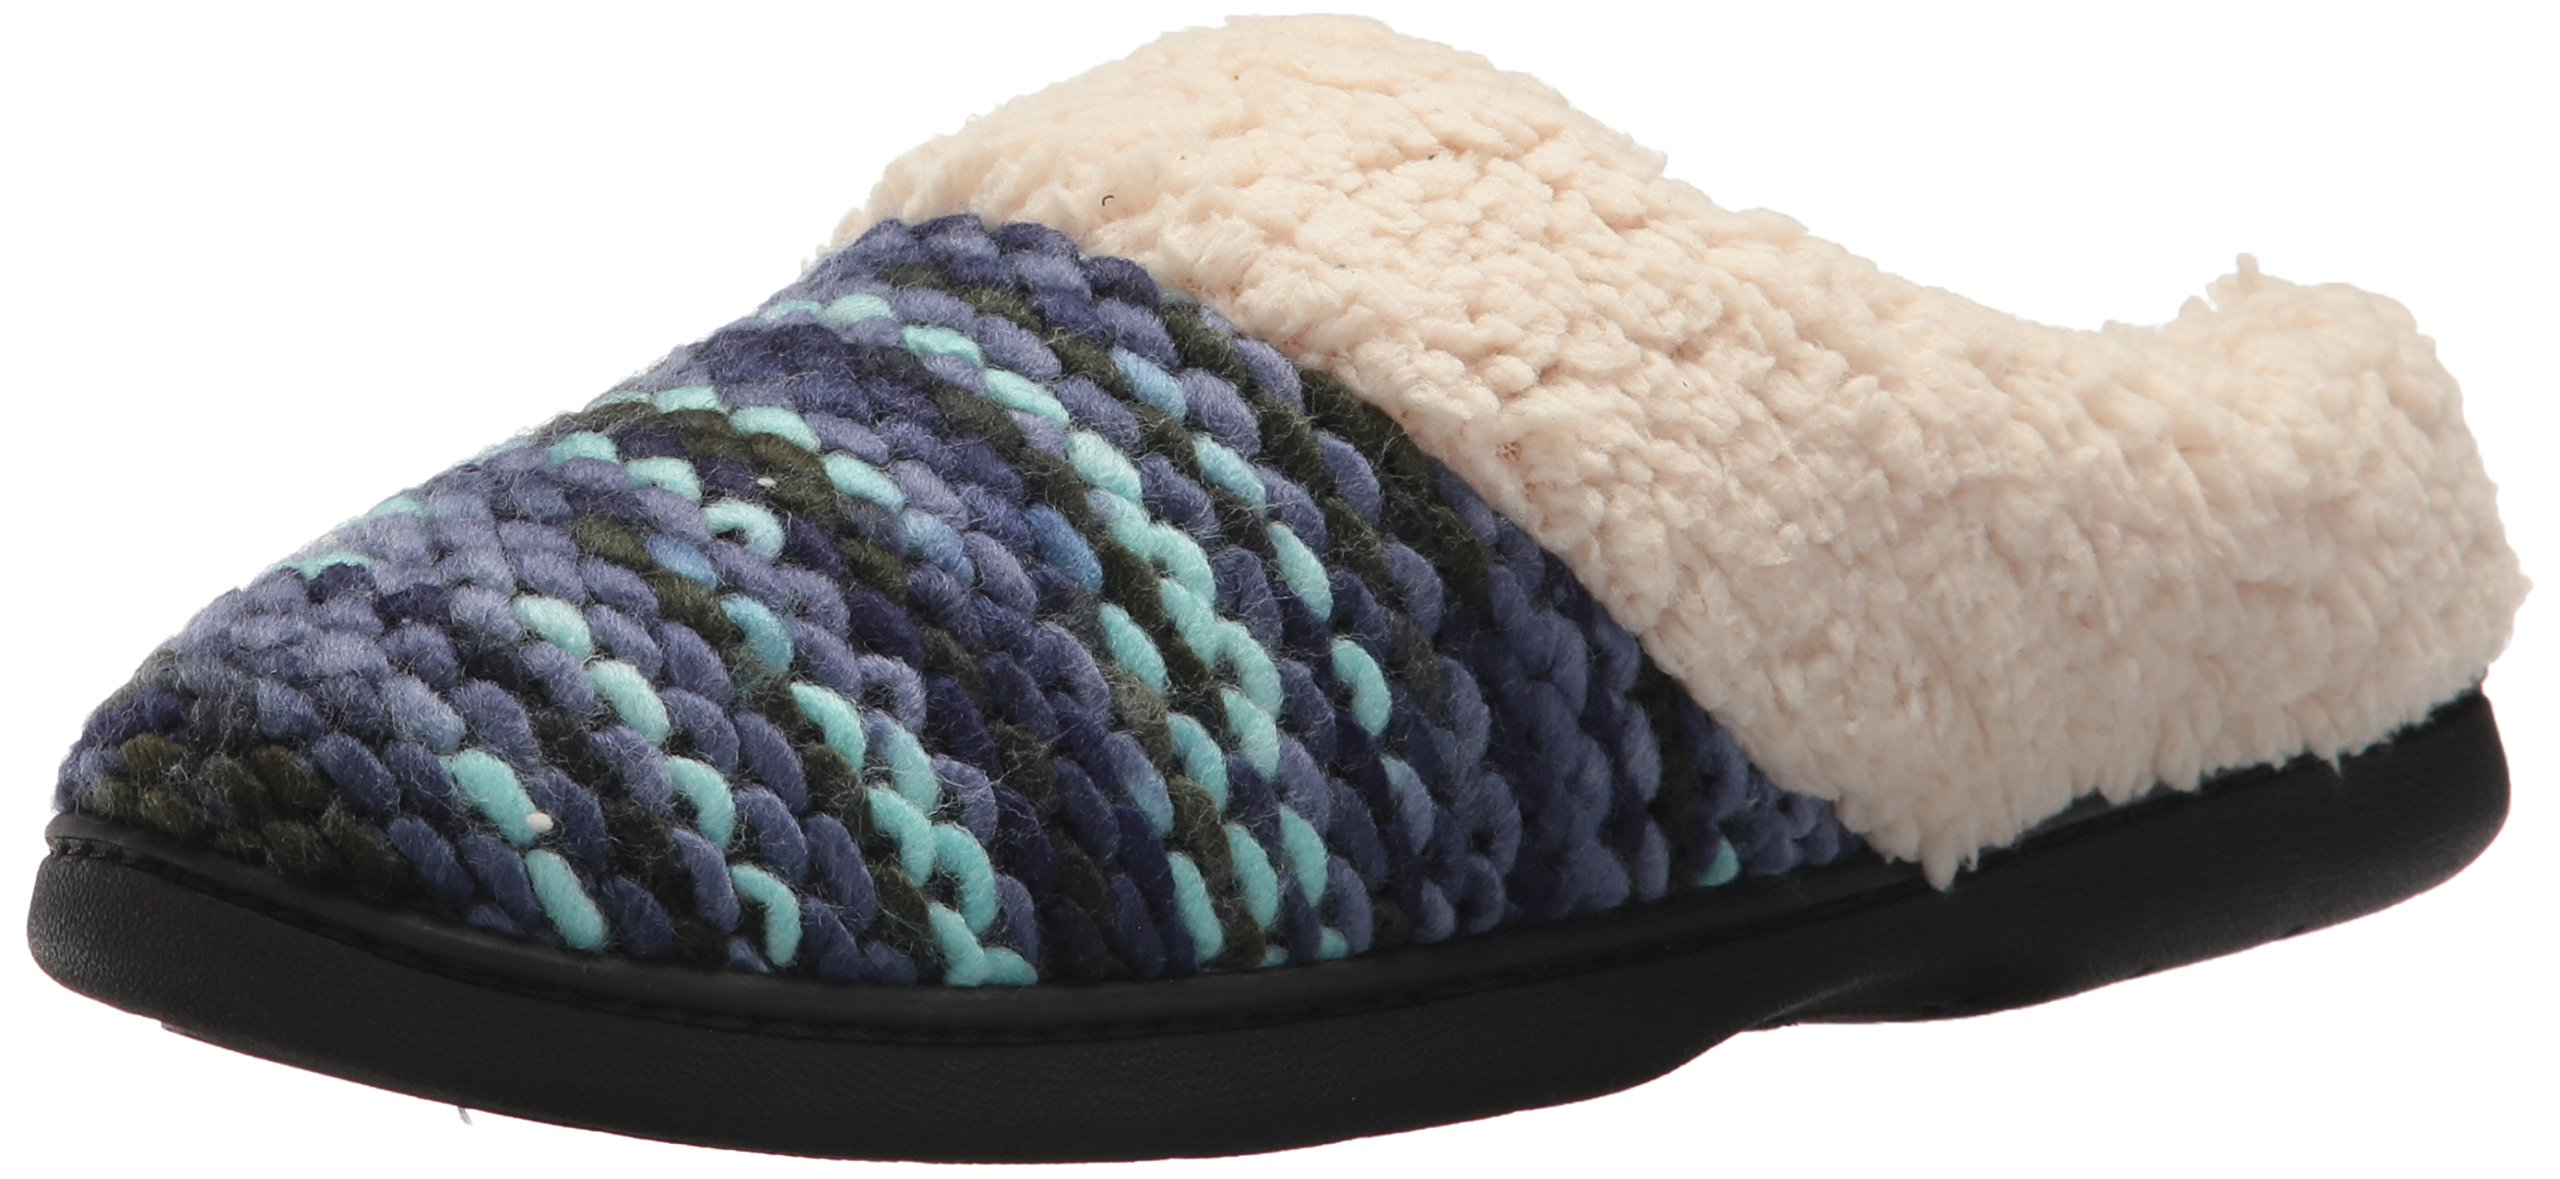 Dearfoams Women's Textured Sweater Knit Clog, Peacoat, S Medium US